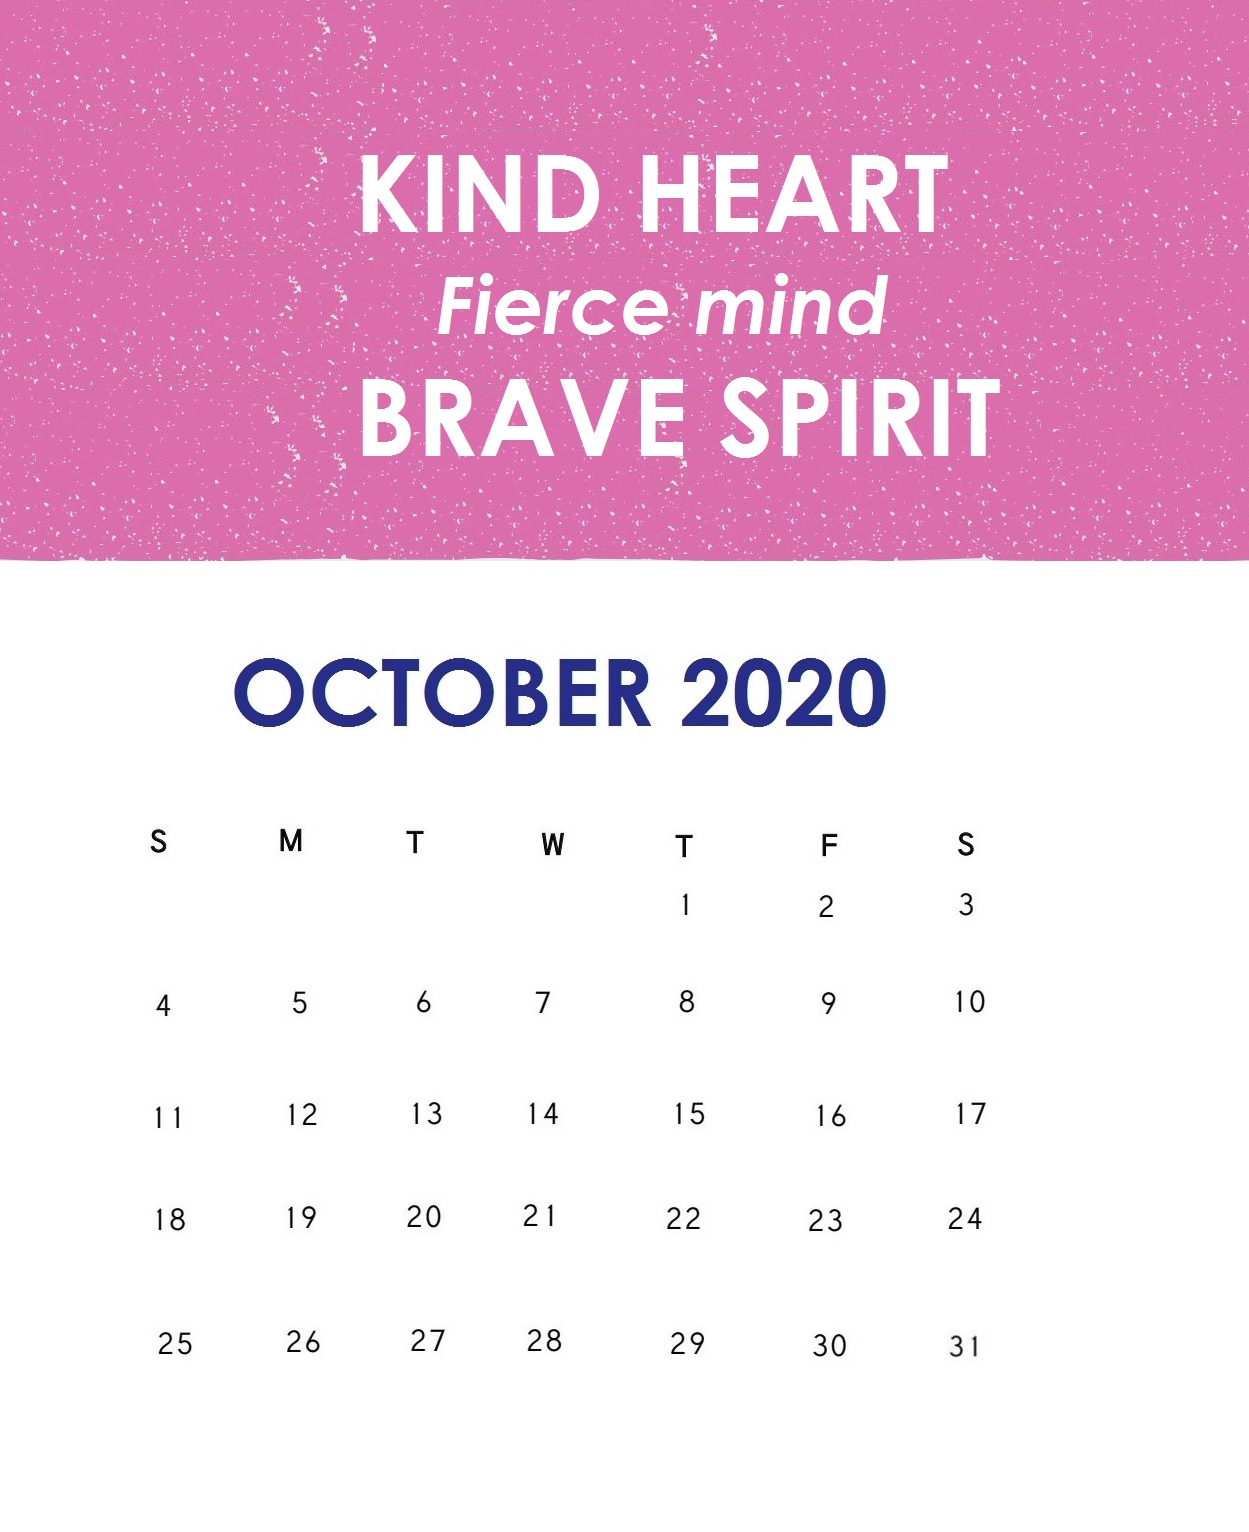 Inspirational October 2020 Calendar